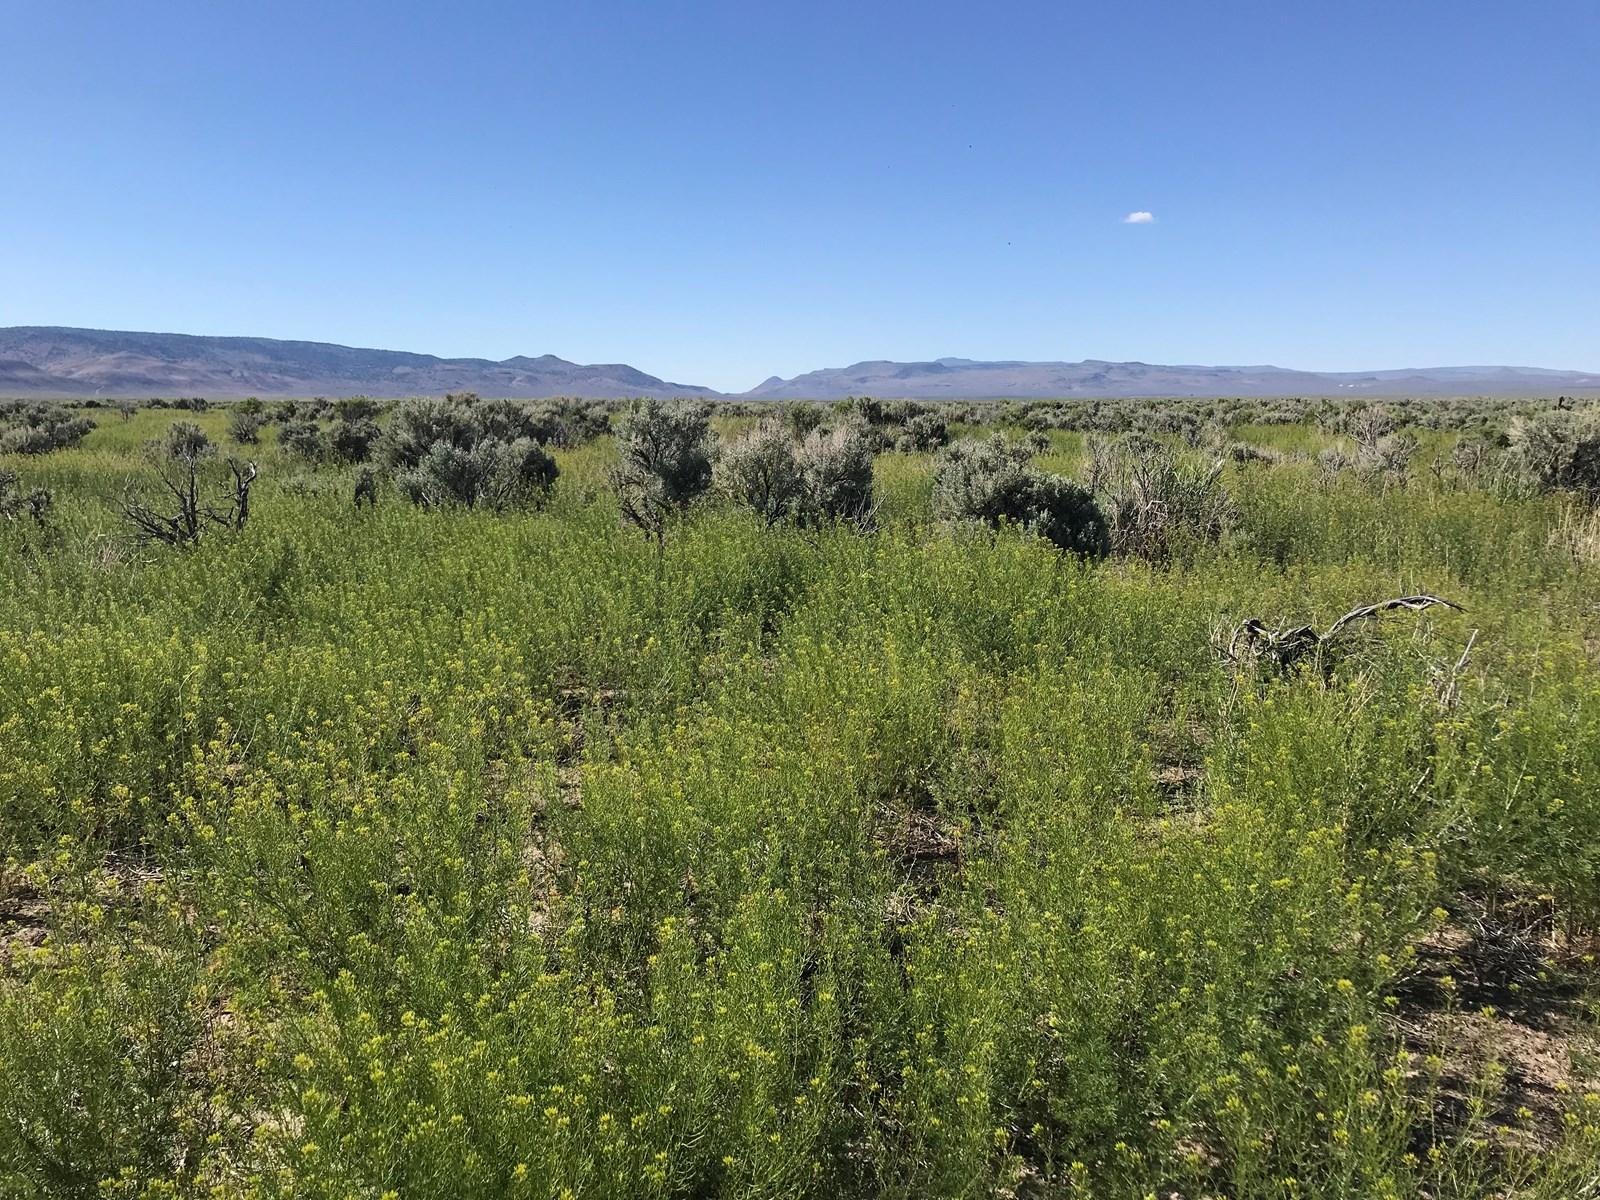 320 Acres Land for Sale, Duck Flat, Mule Deer Hunting